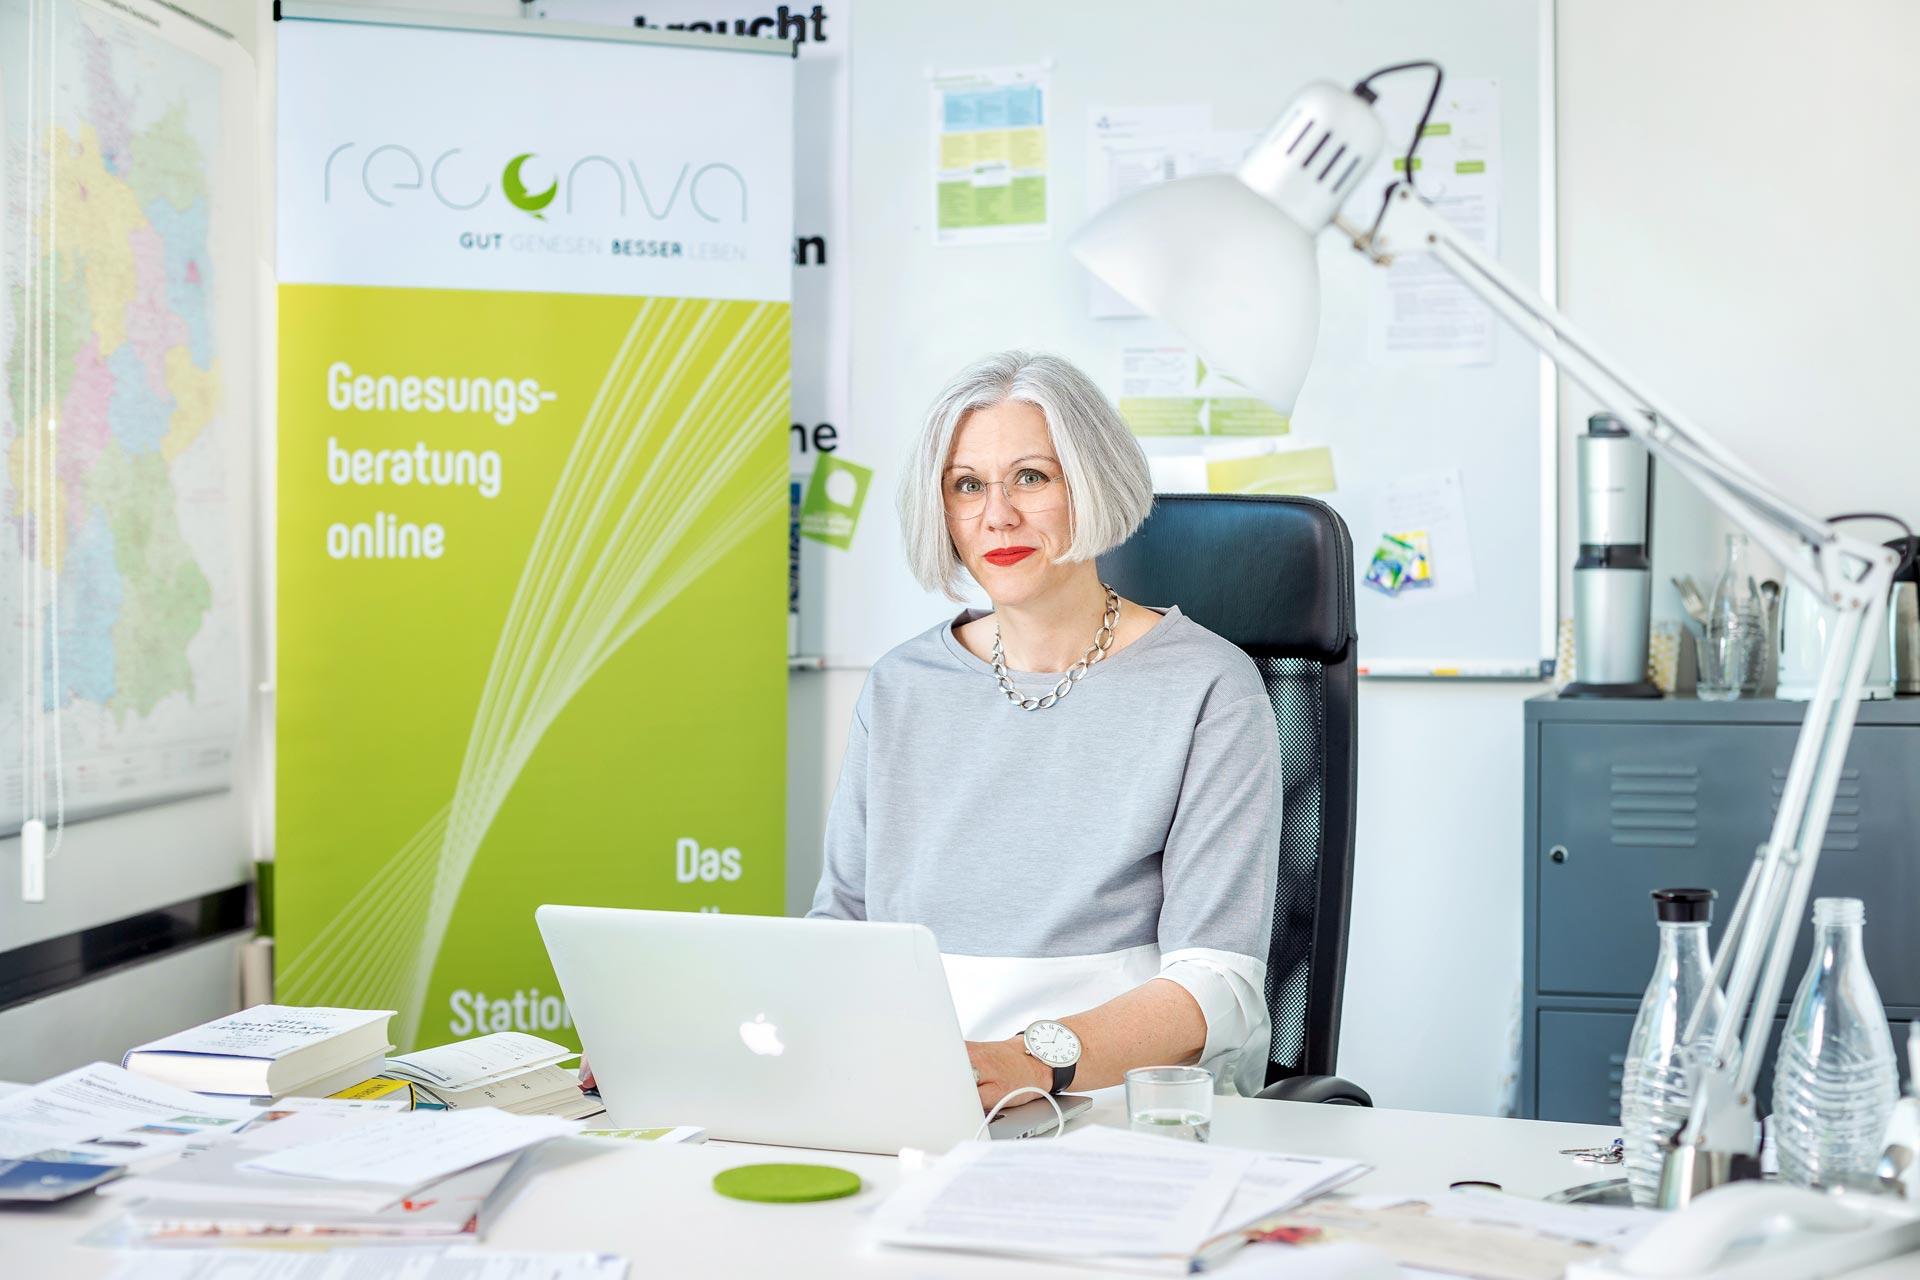 corporate-fotografie-genesungsberatung-online-start-up-gruenderin-ceo